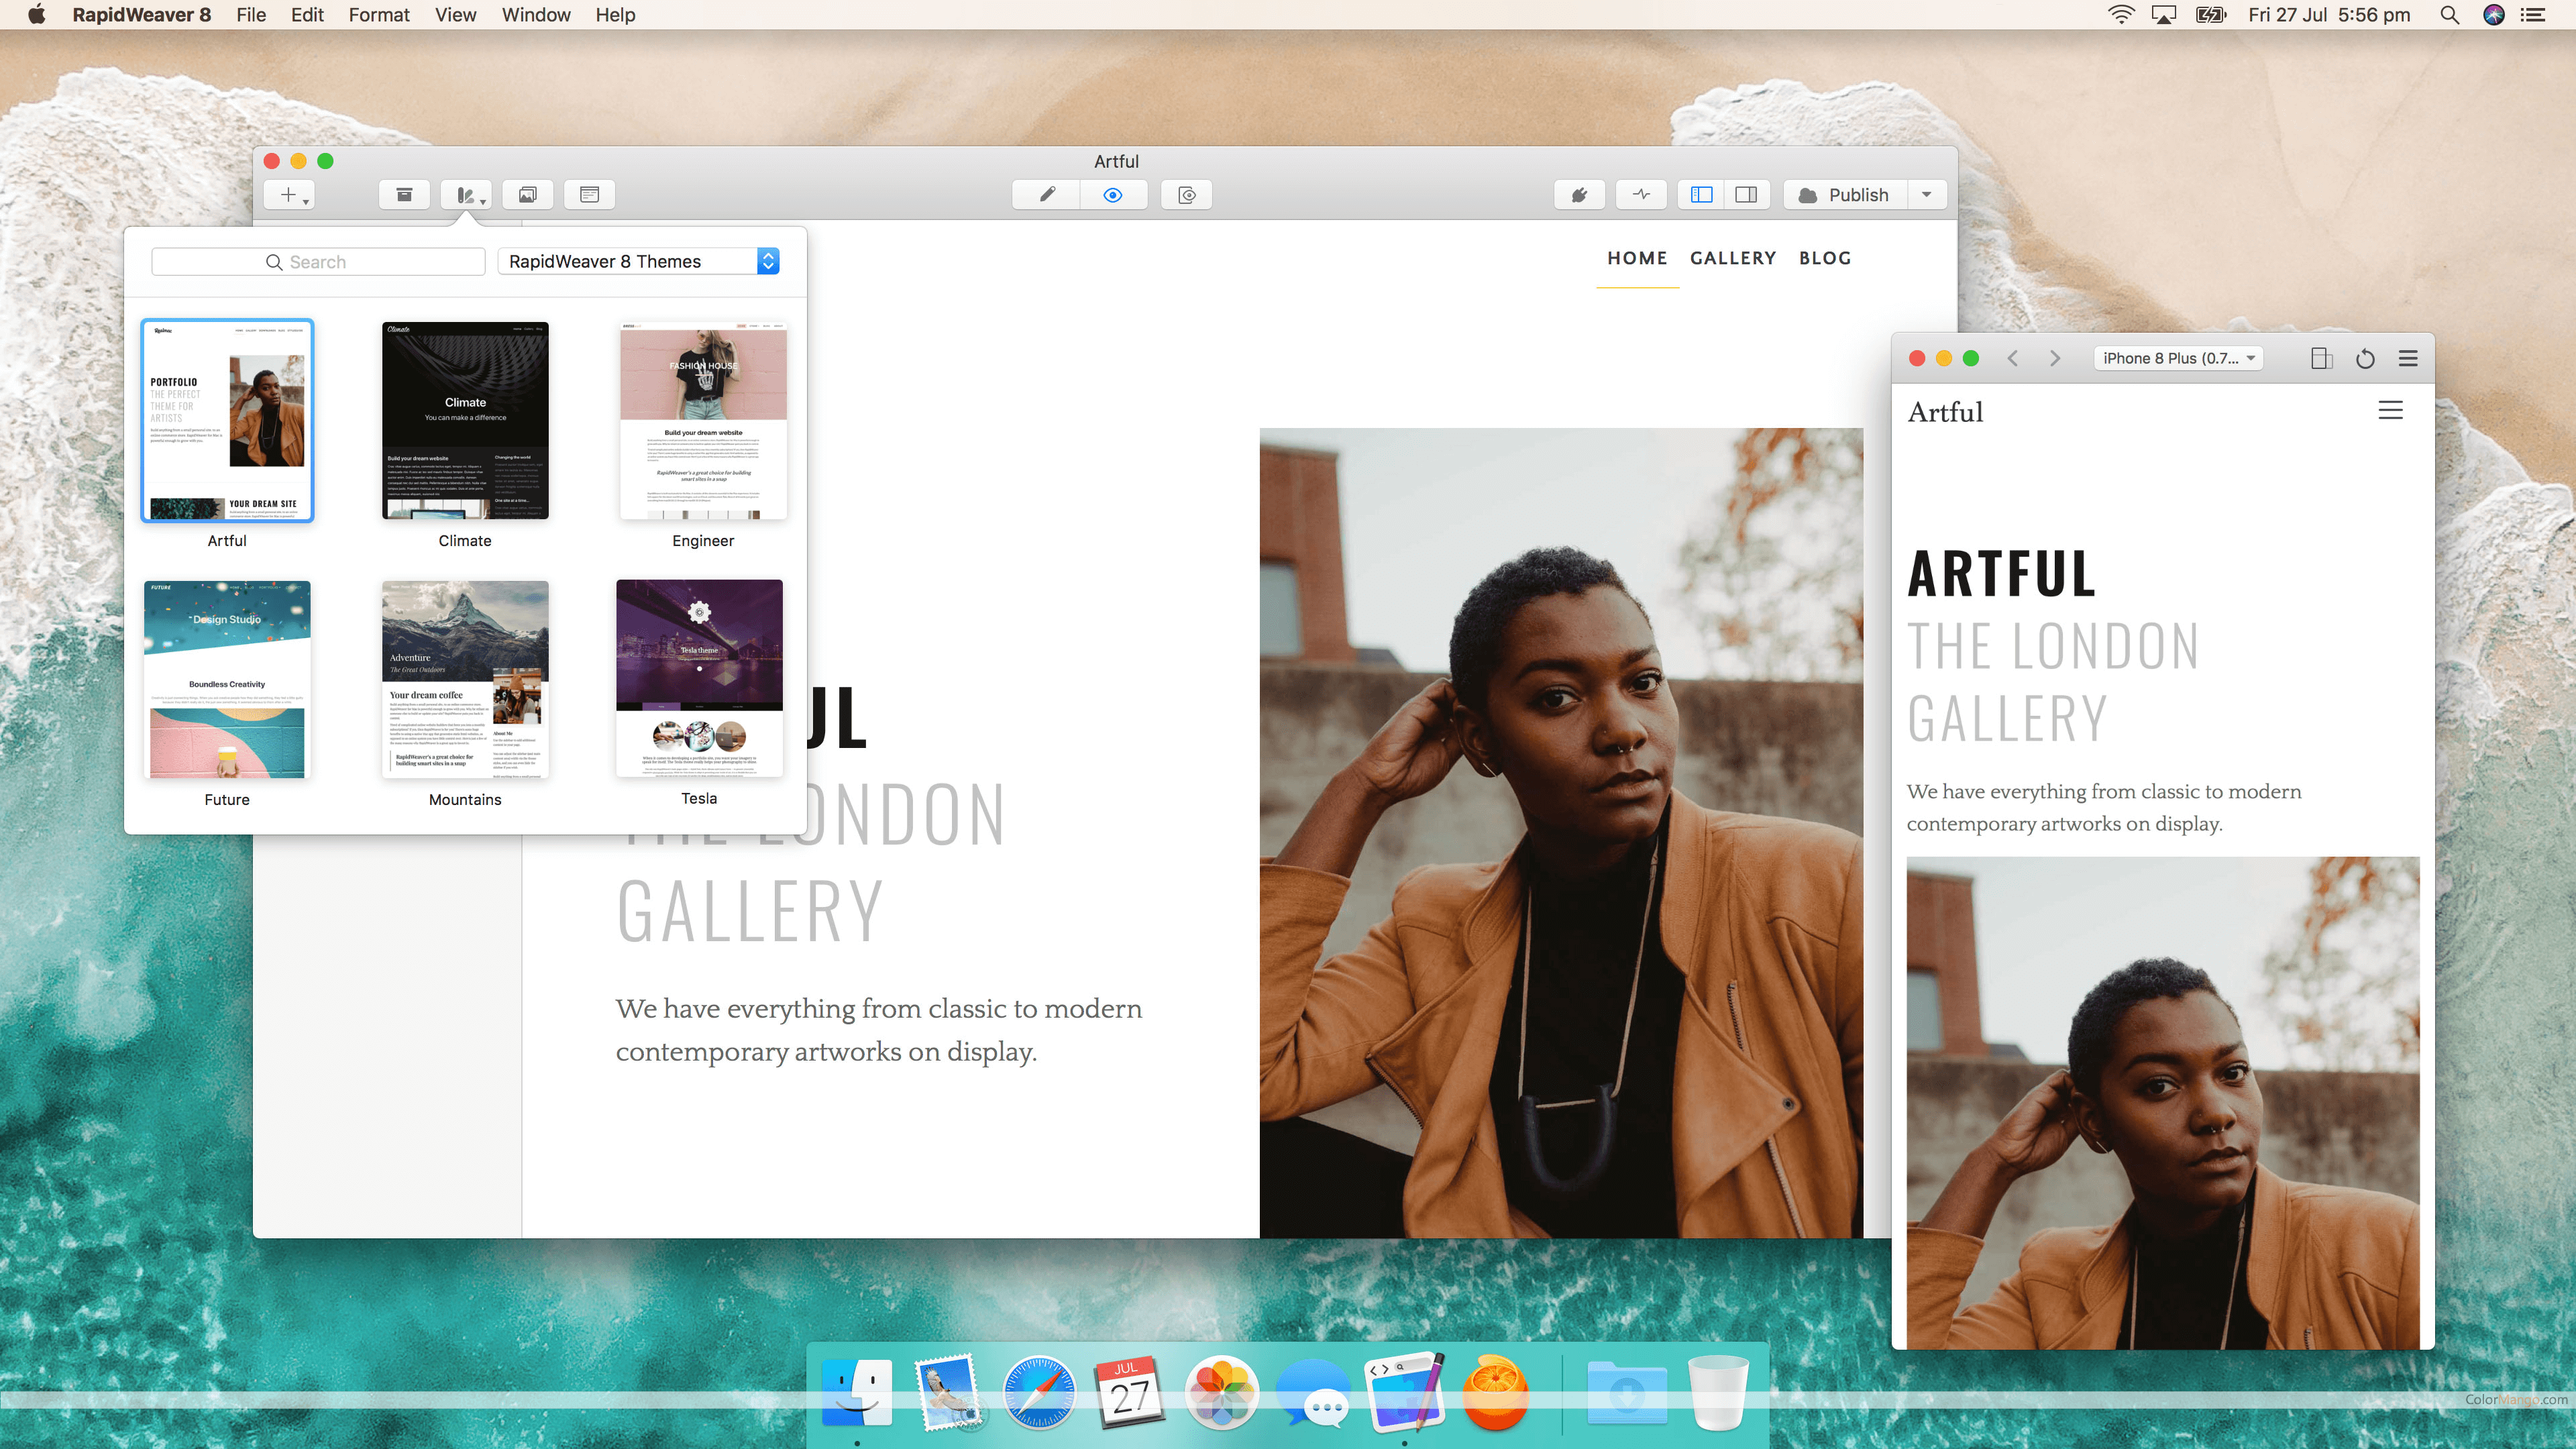 RapidWeaver Screenshot